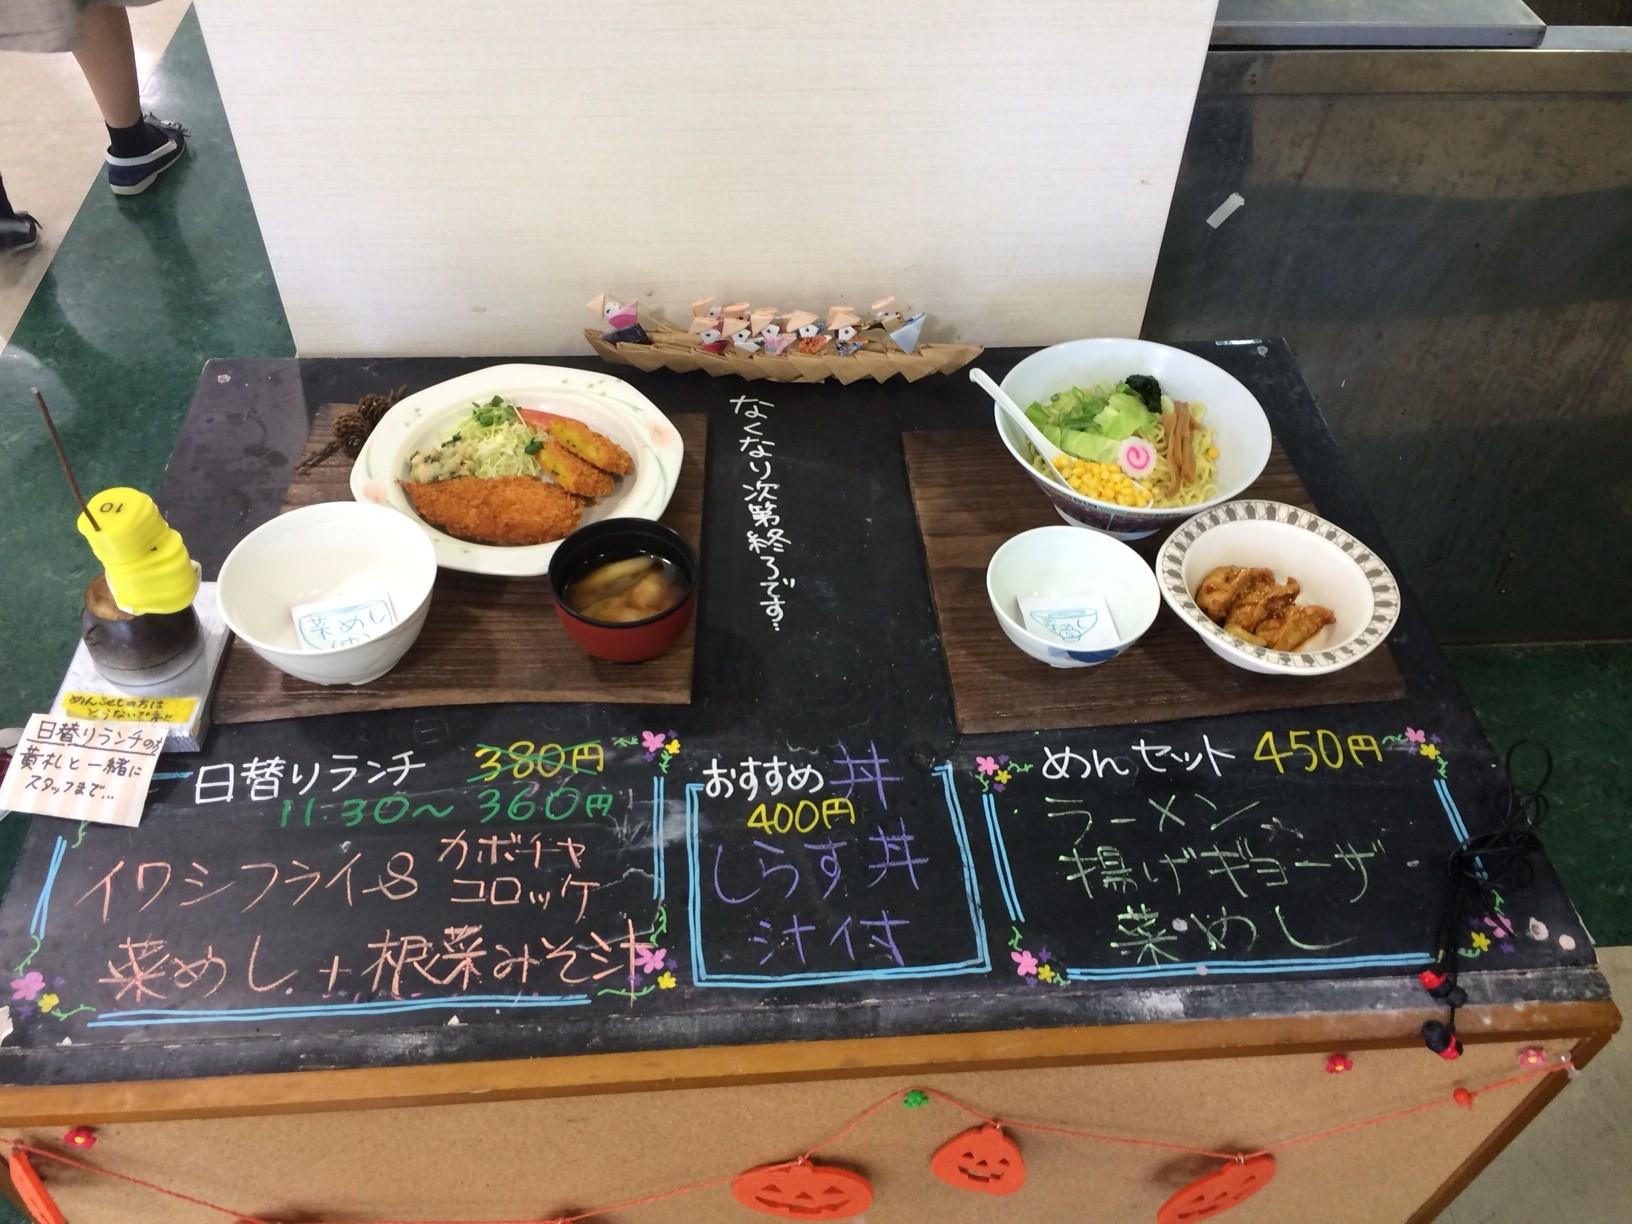 名古屋造形大学 元学長小林亮介ブログ10月16日(金)晴れ